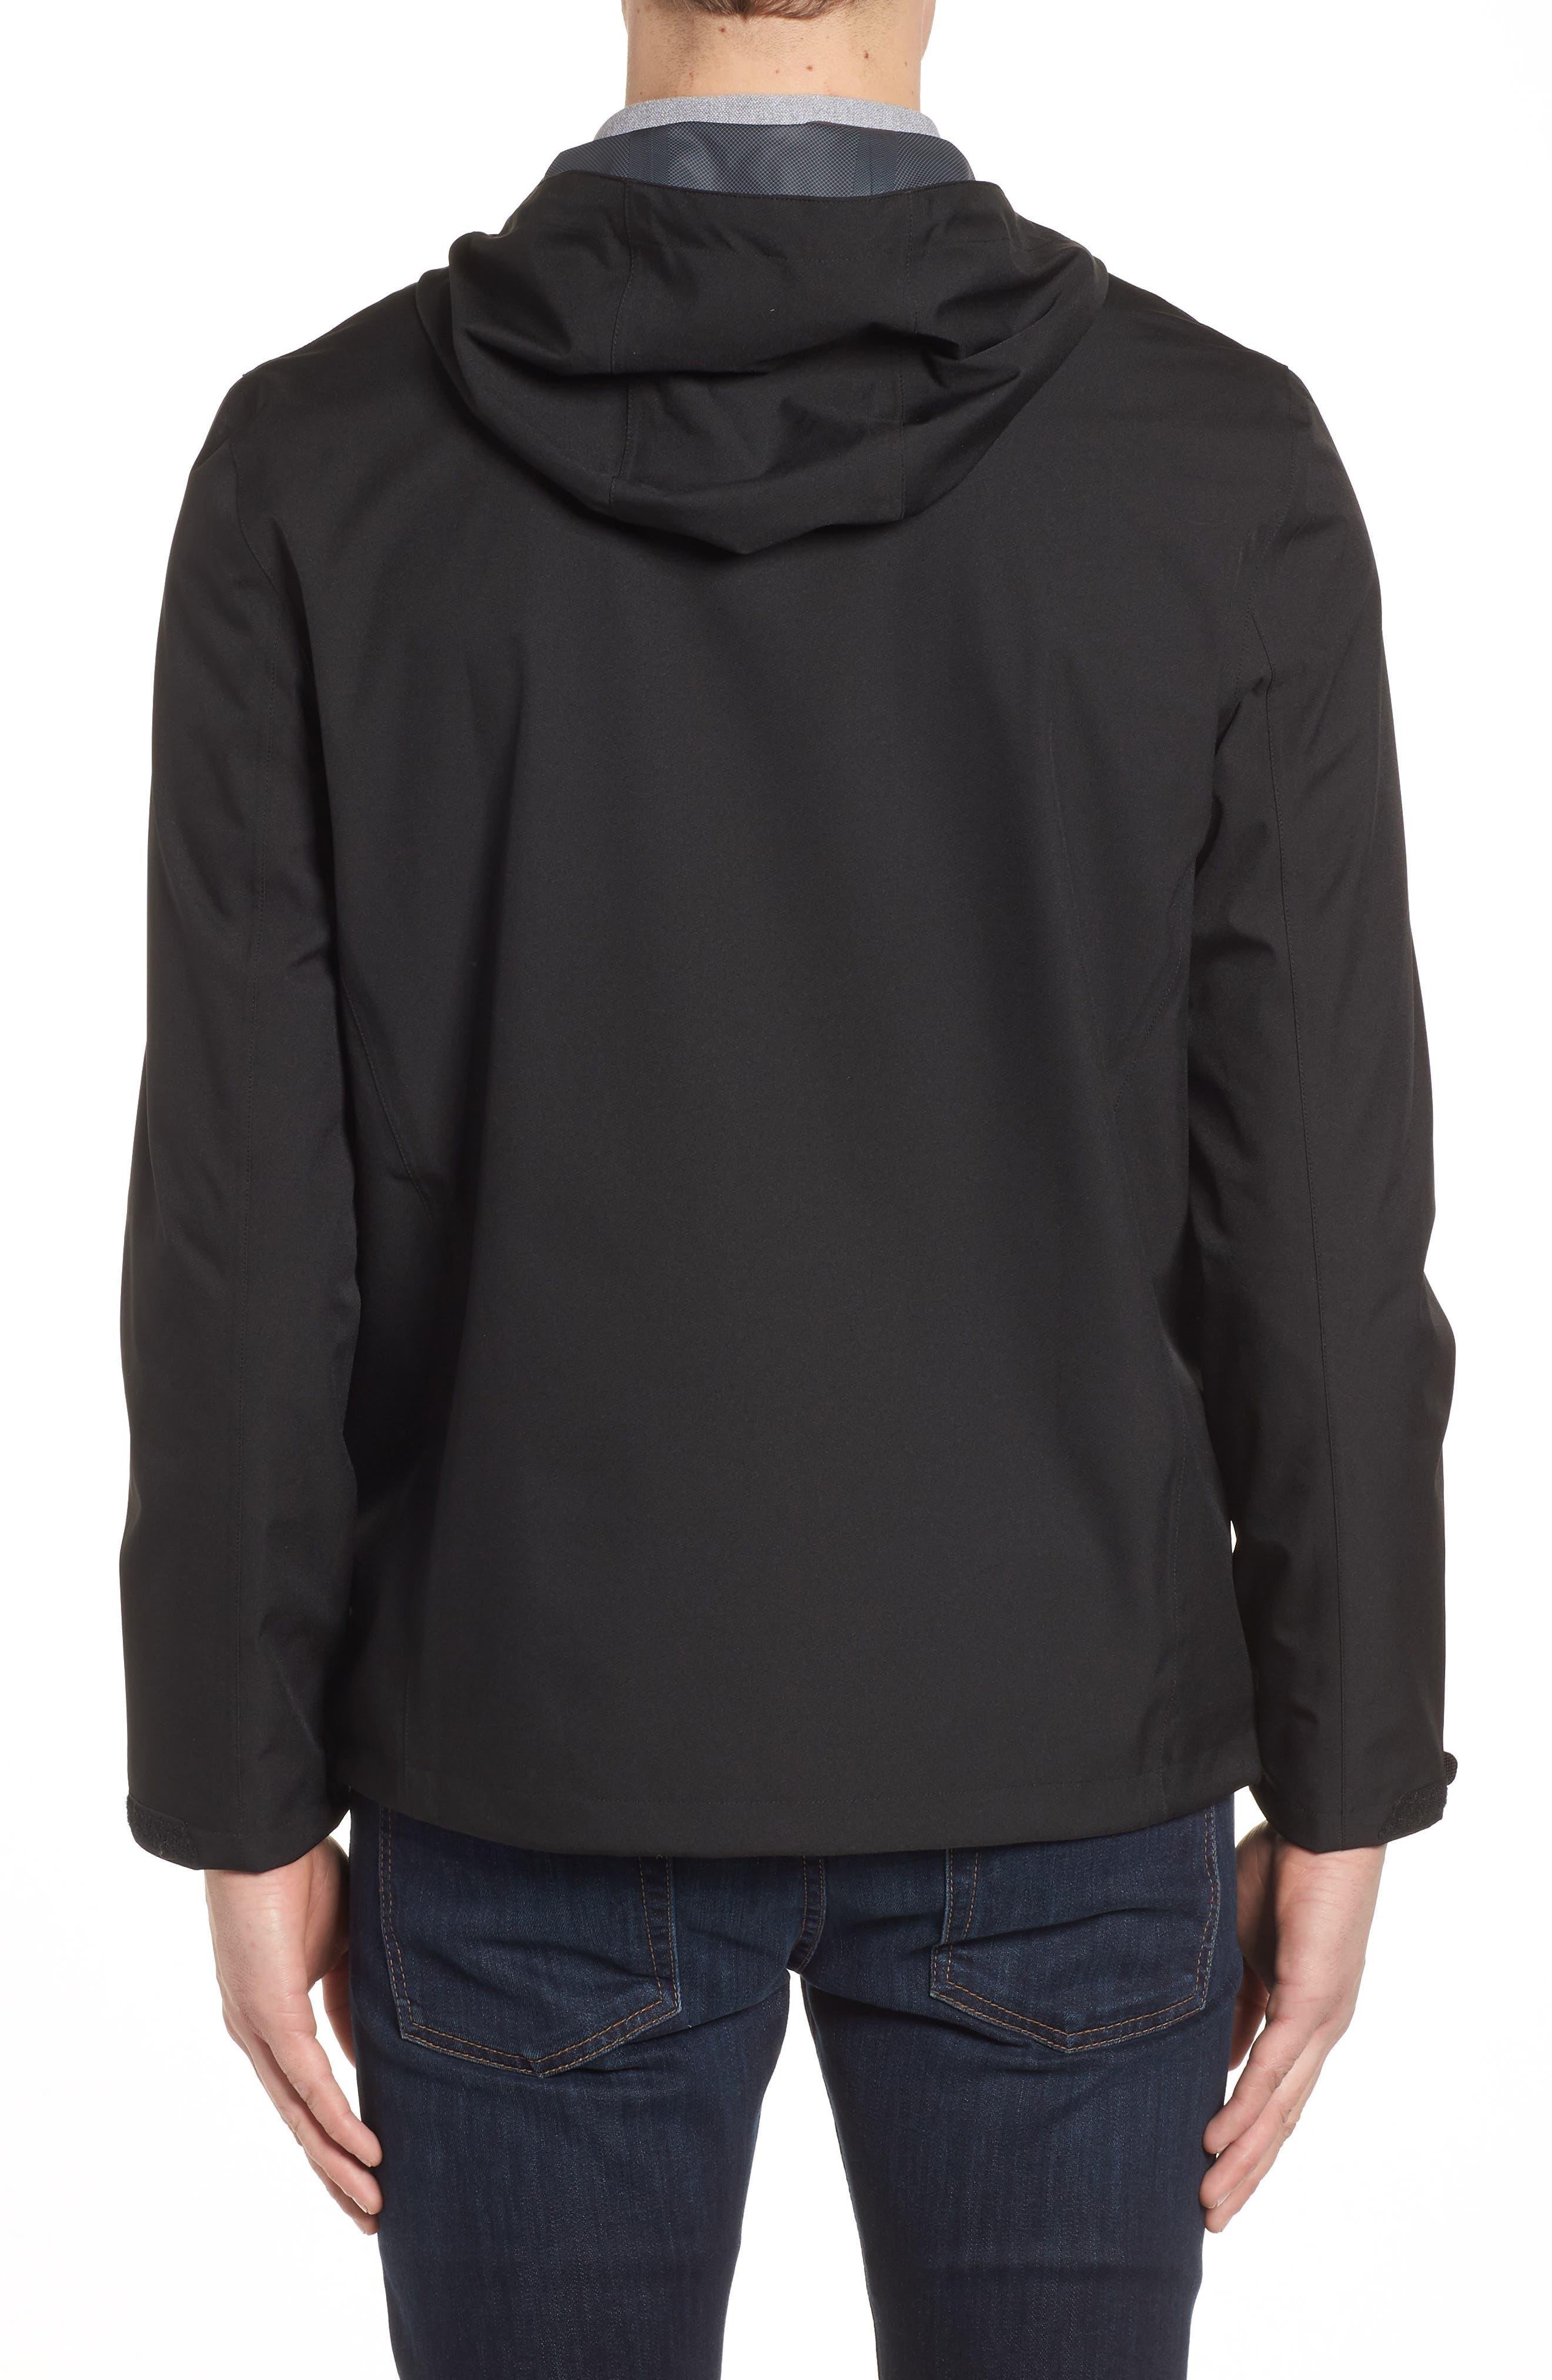 Seam Sealed Packable Jacket,                             Alternate thumbnail 2, color,                             Black